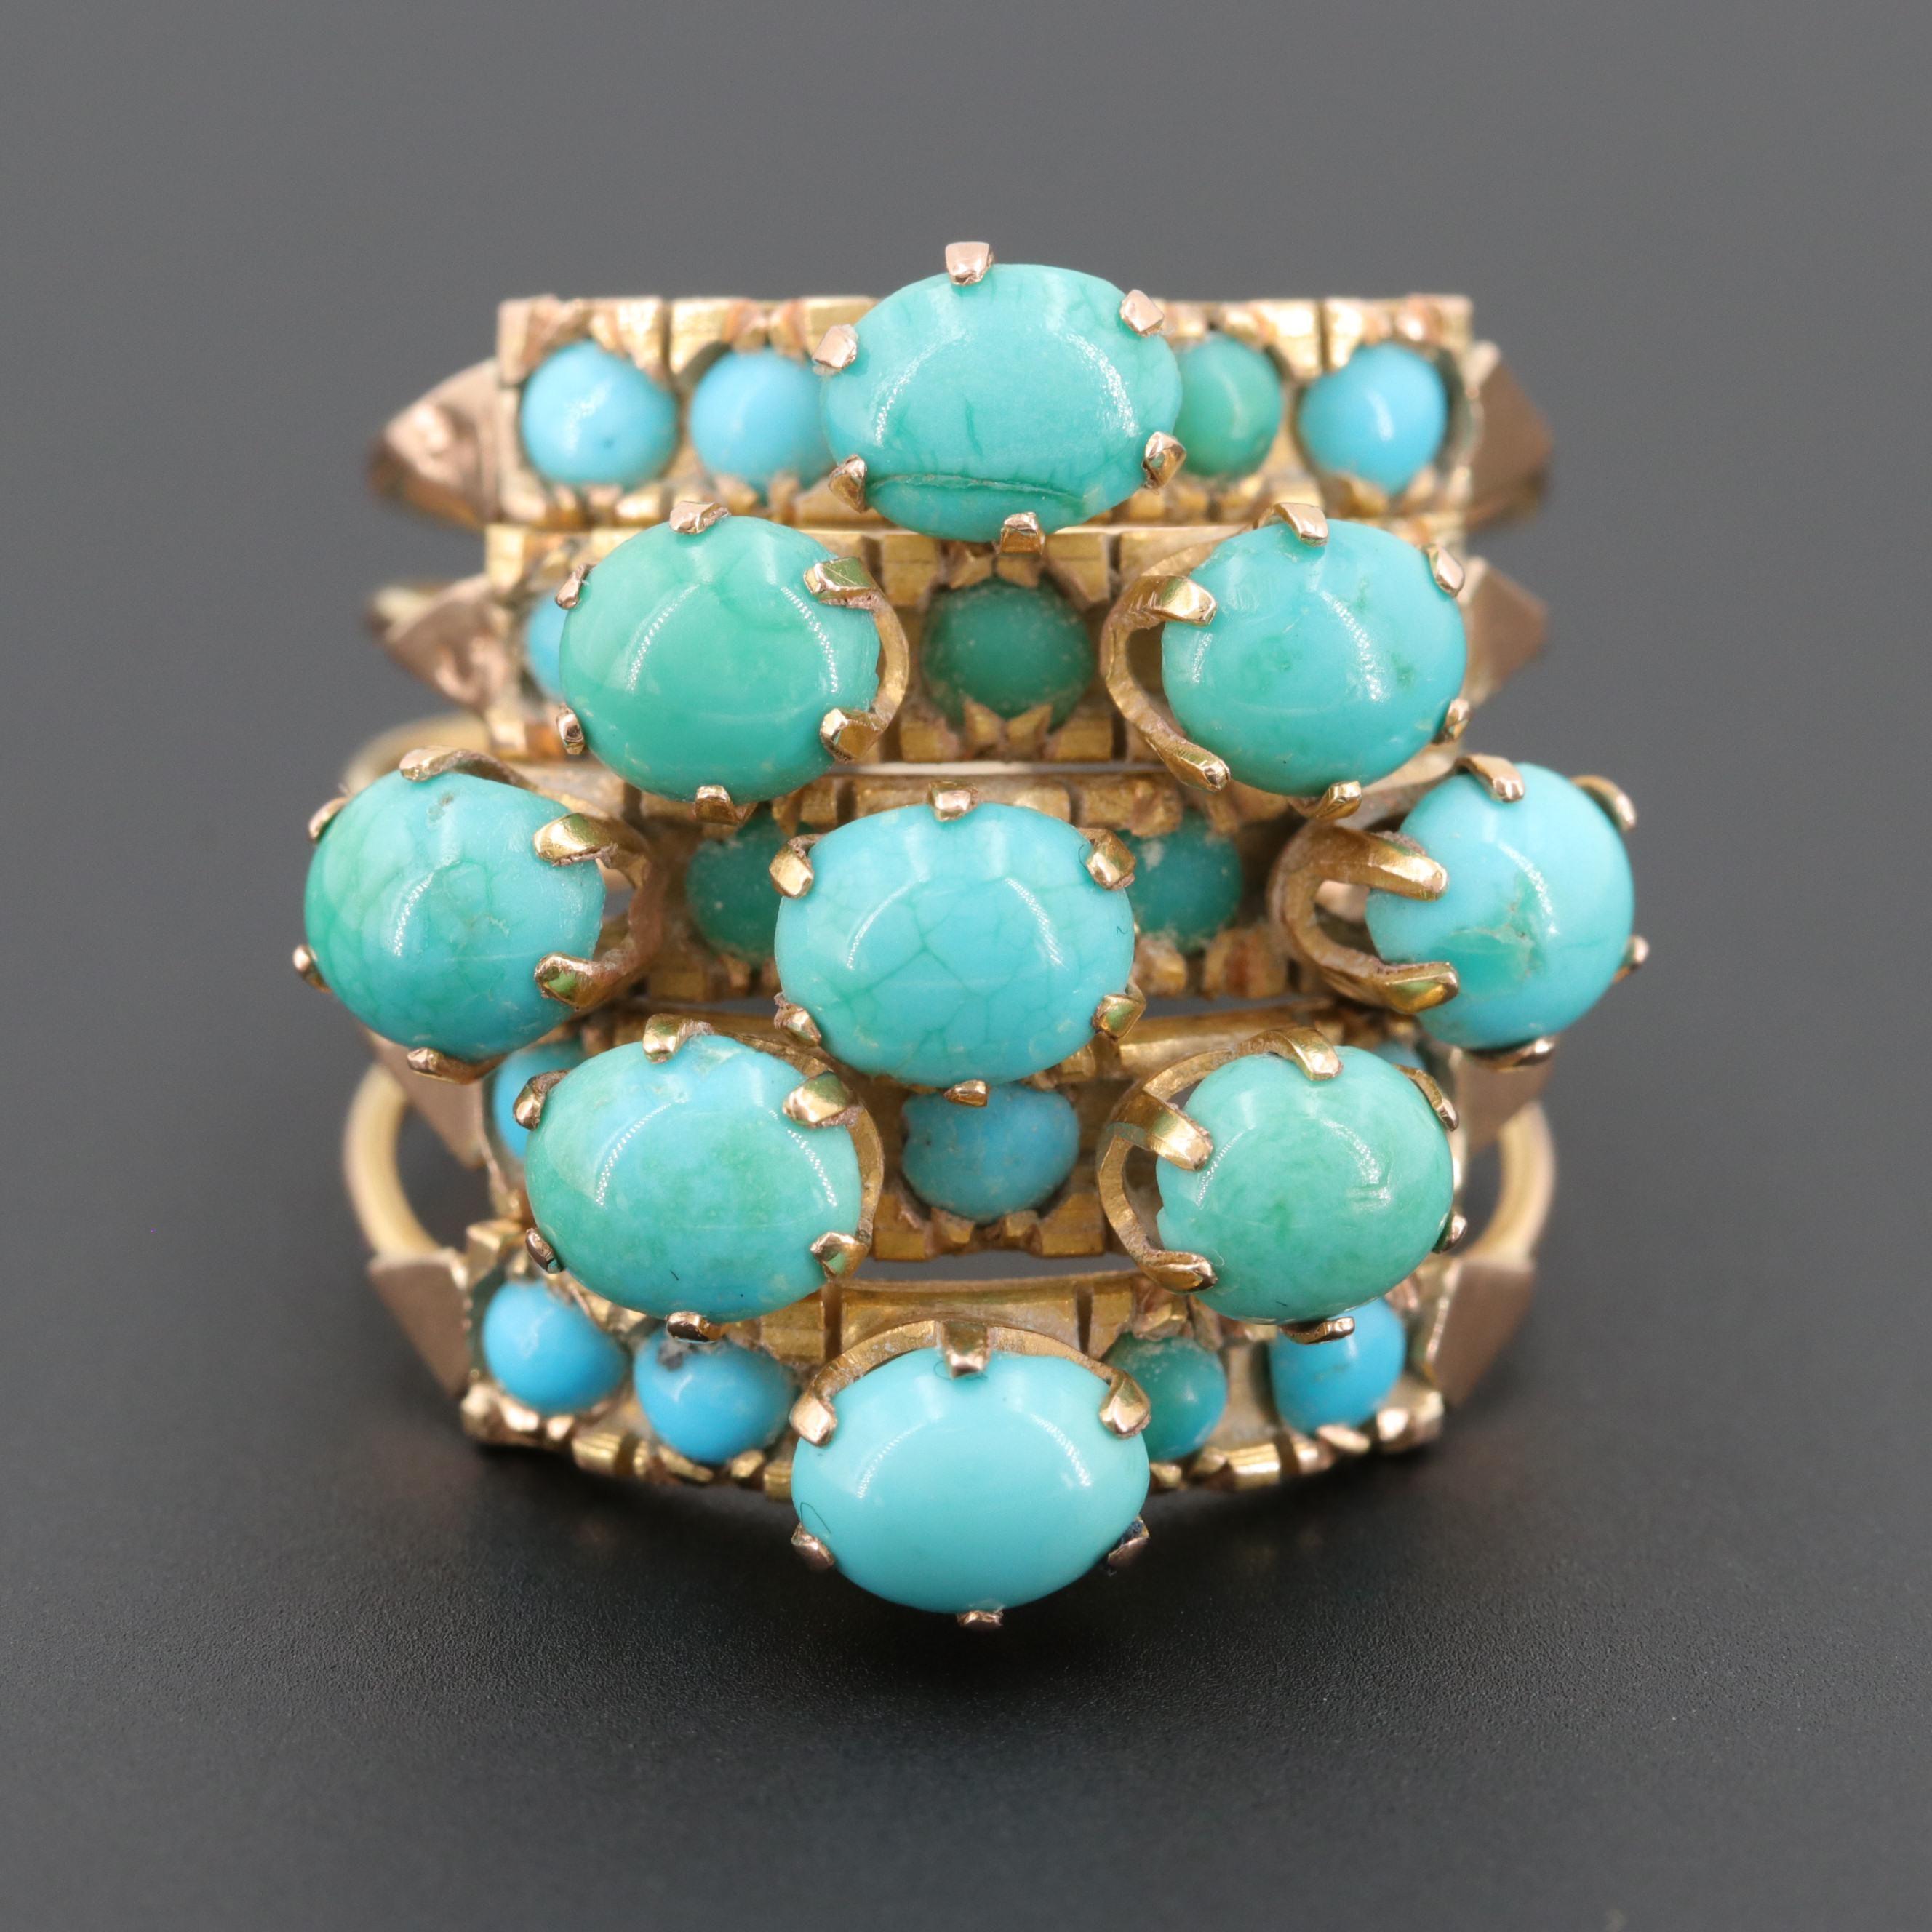 Vintage 14K Yellow Gold Turquoise Harem Ring